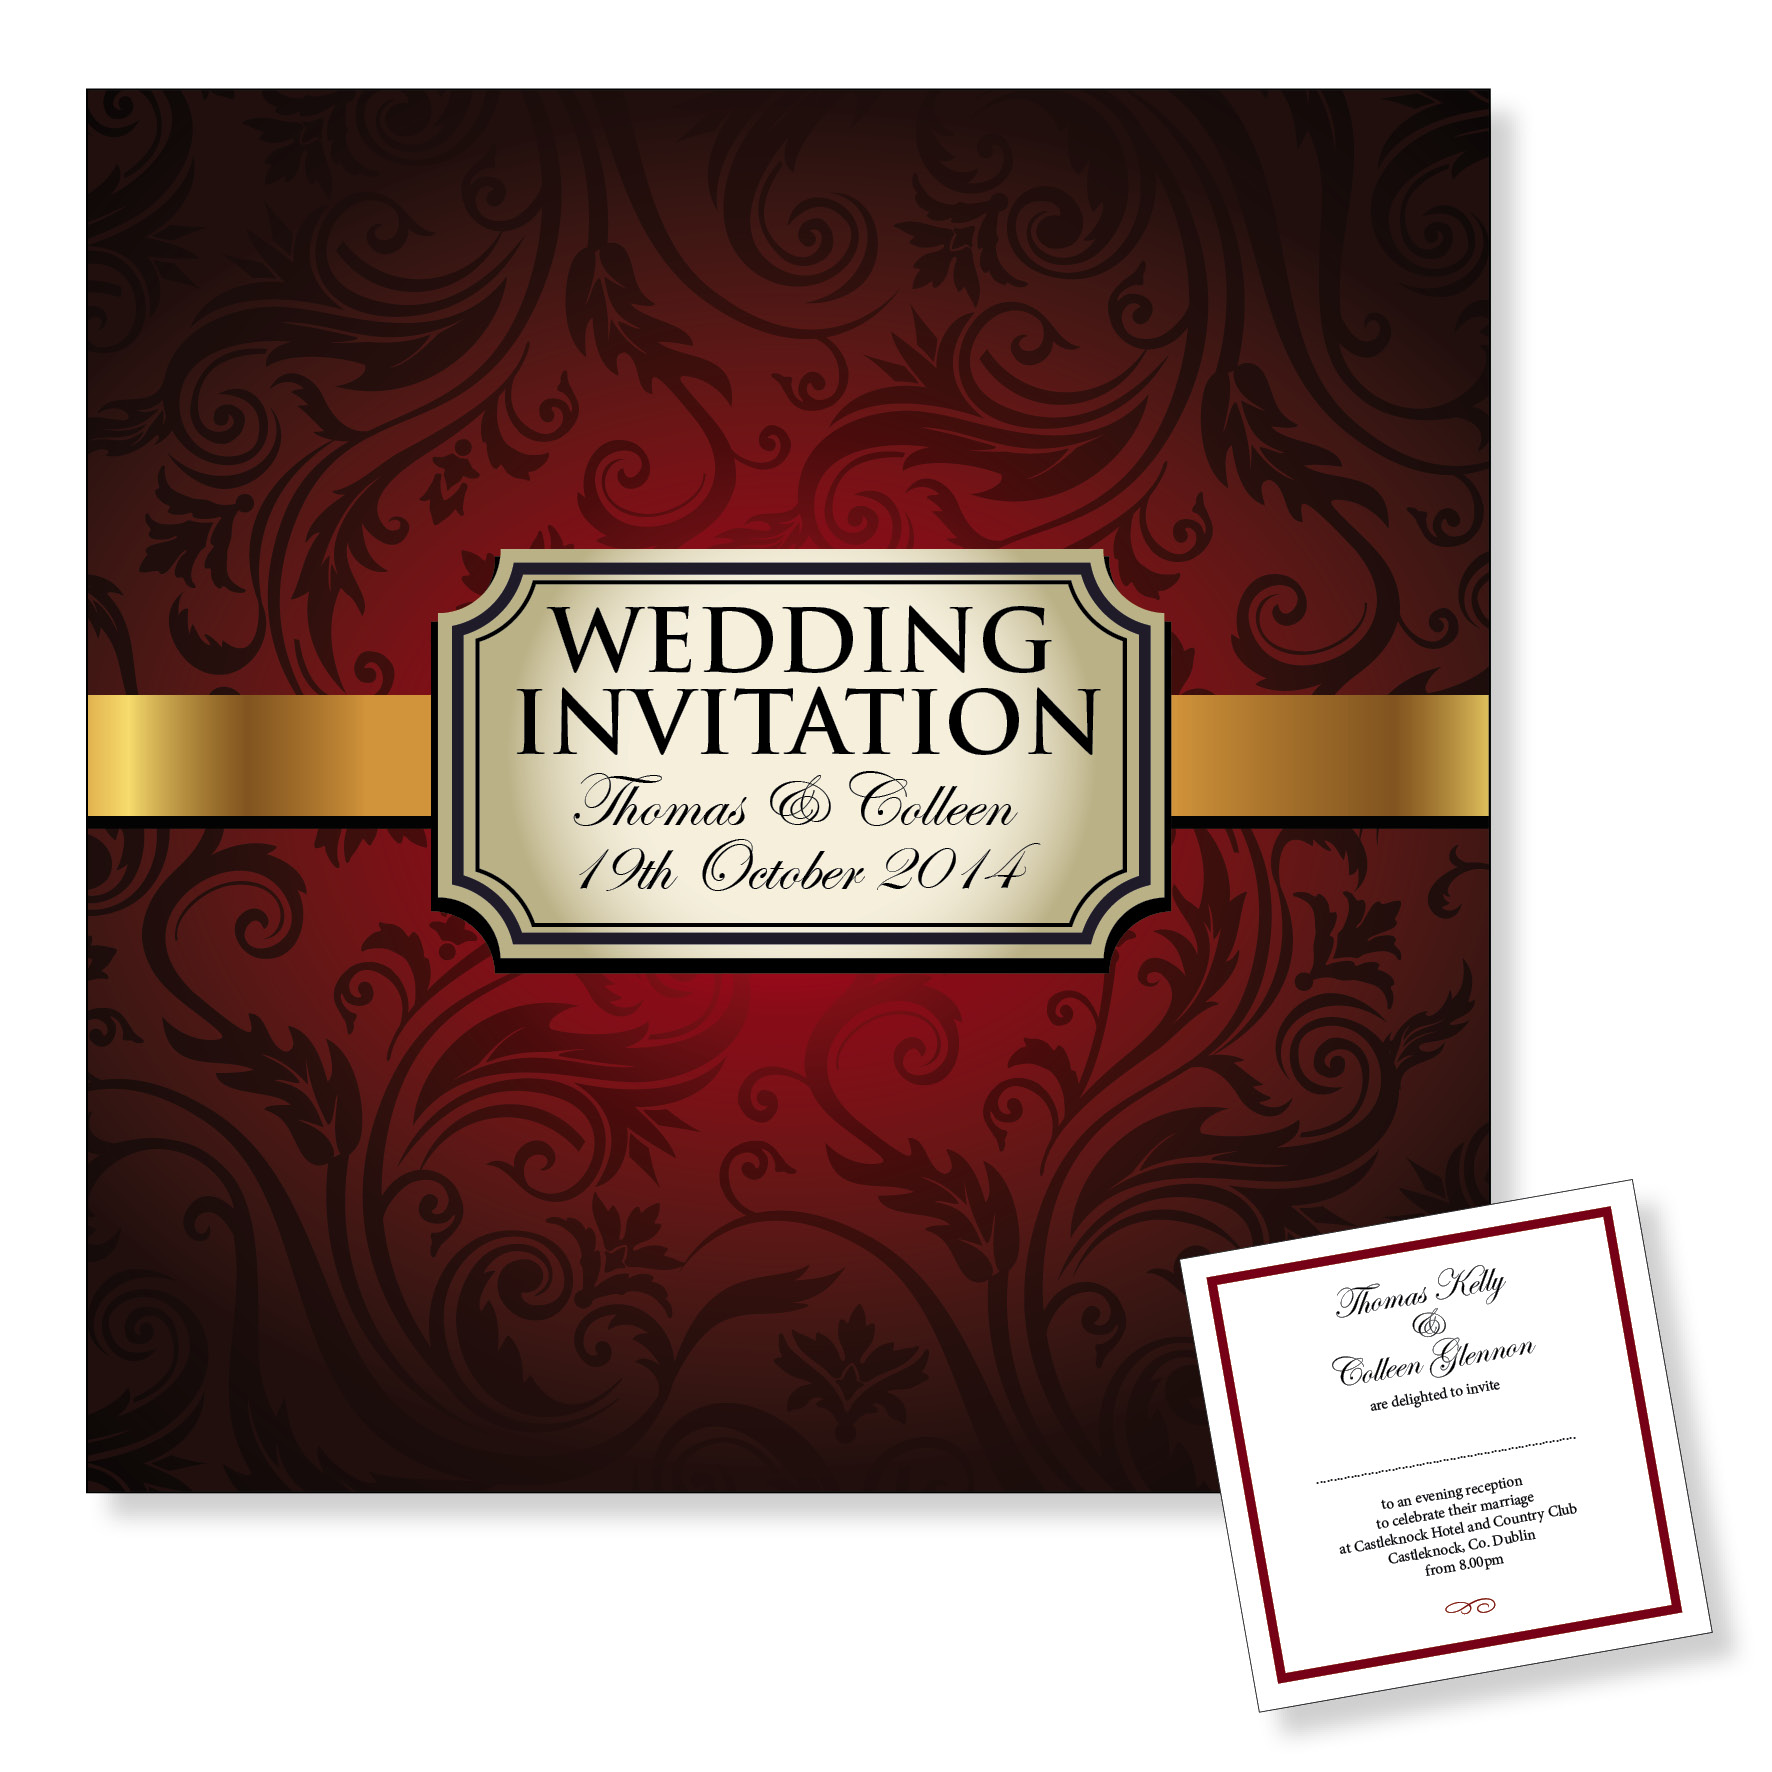 Evening wedding invitation - Red vintage